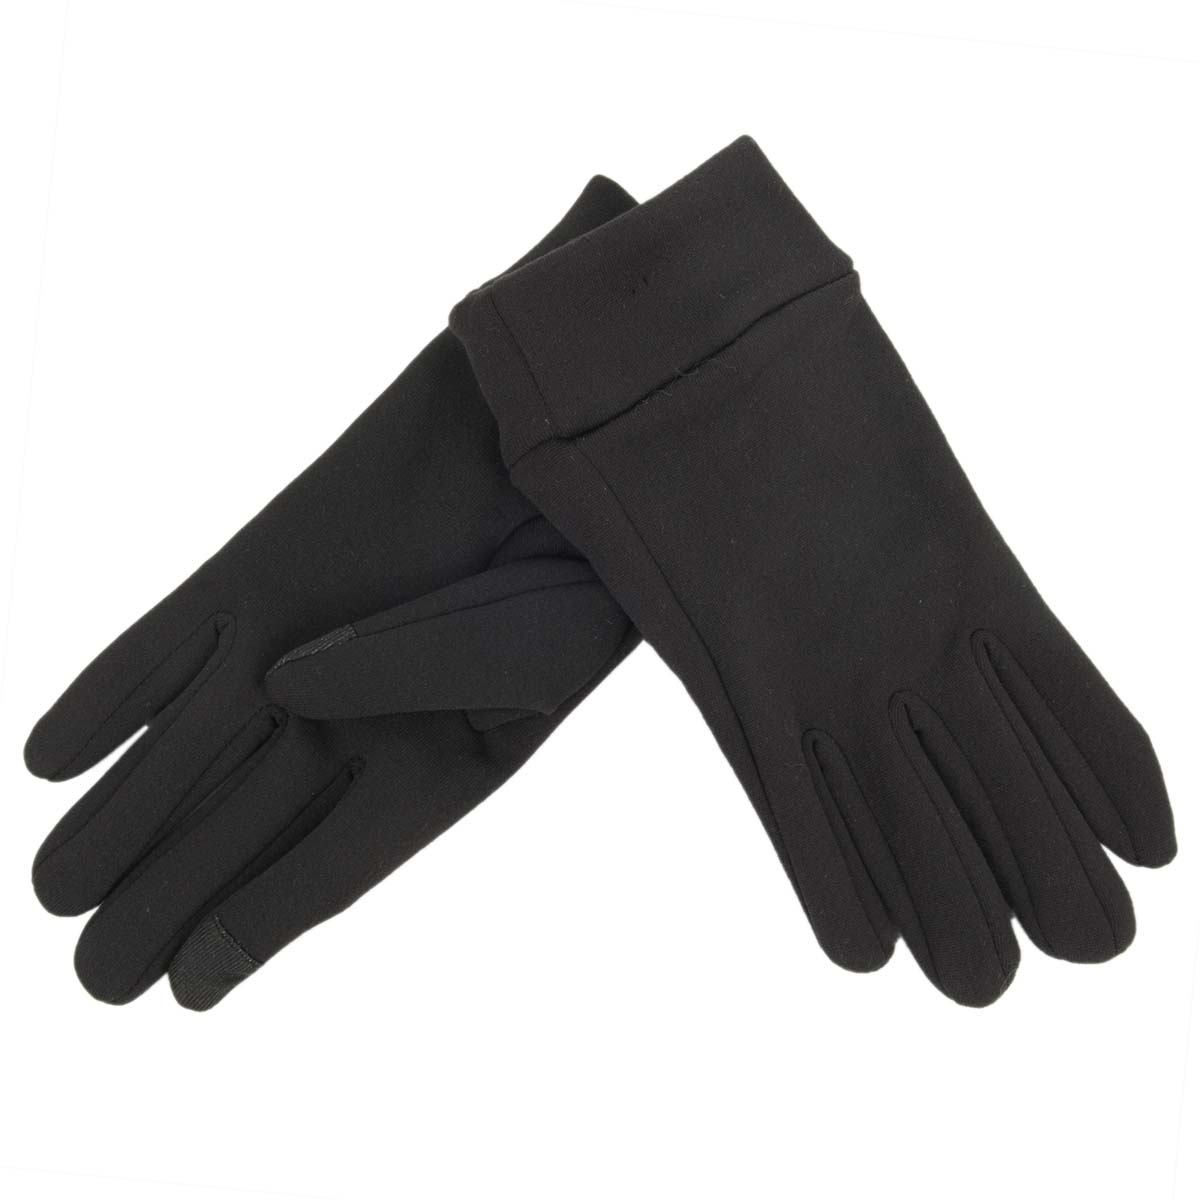 warme handschuhe mit touch funktion. Black Bedroom Furniture Sets. Home Design Ideas